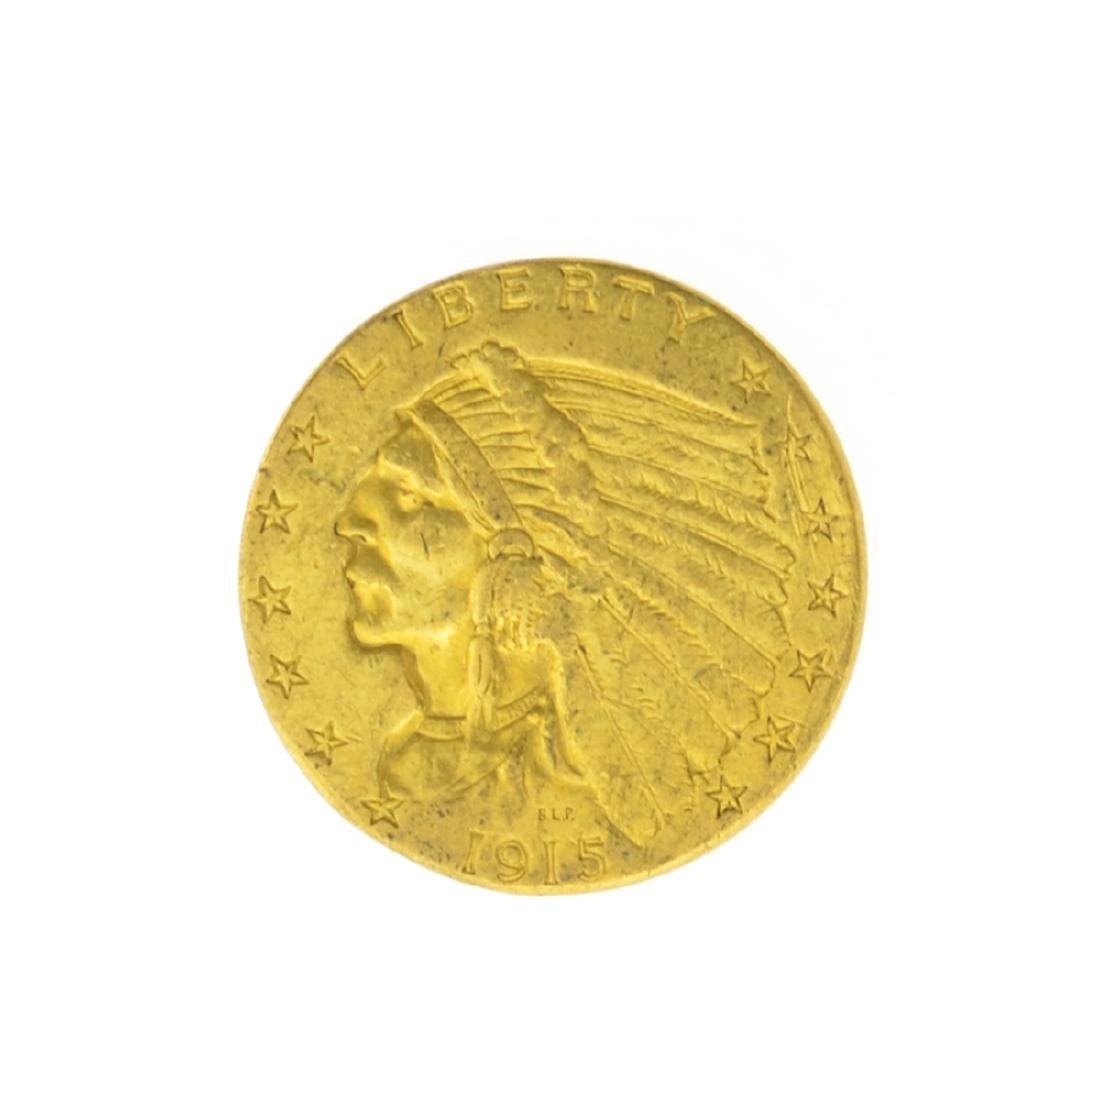 *1915 $2.50 U.S. Indian Head Gold Coin (JG)